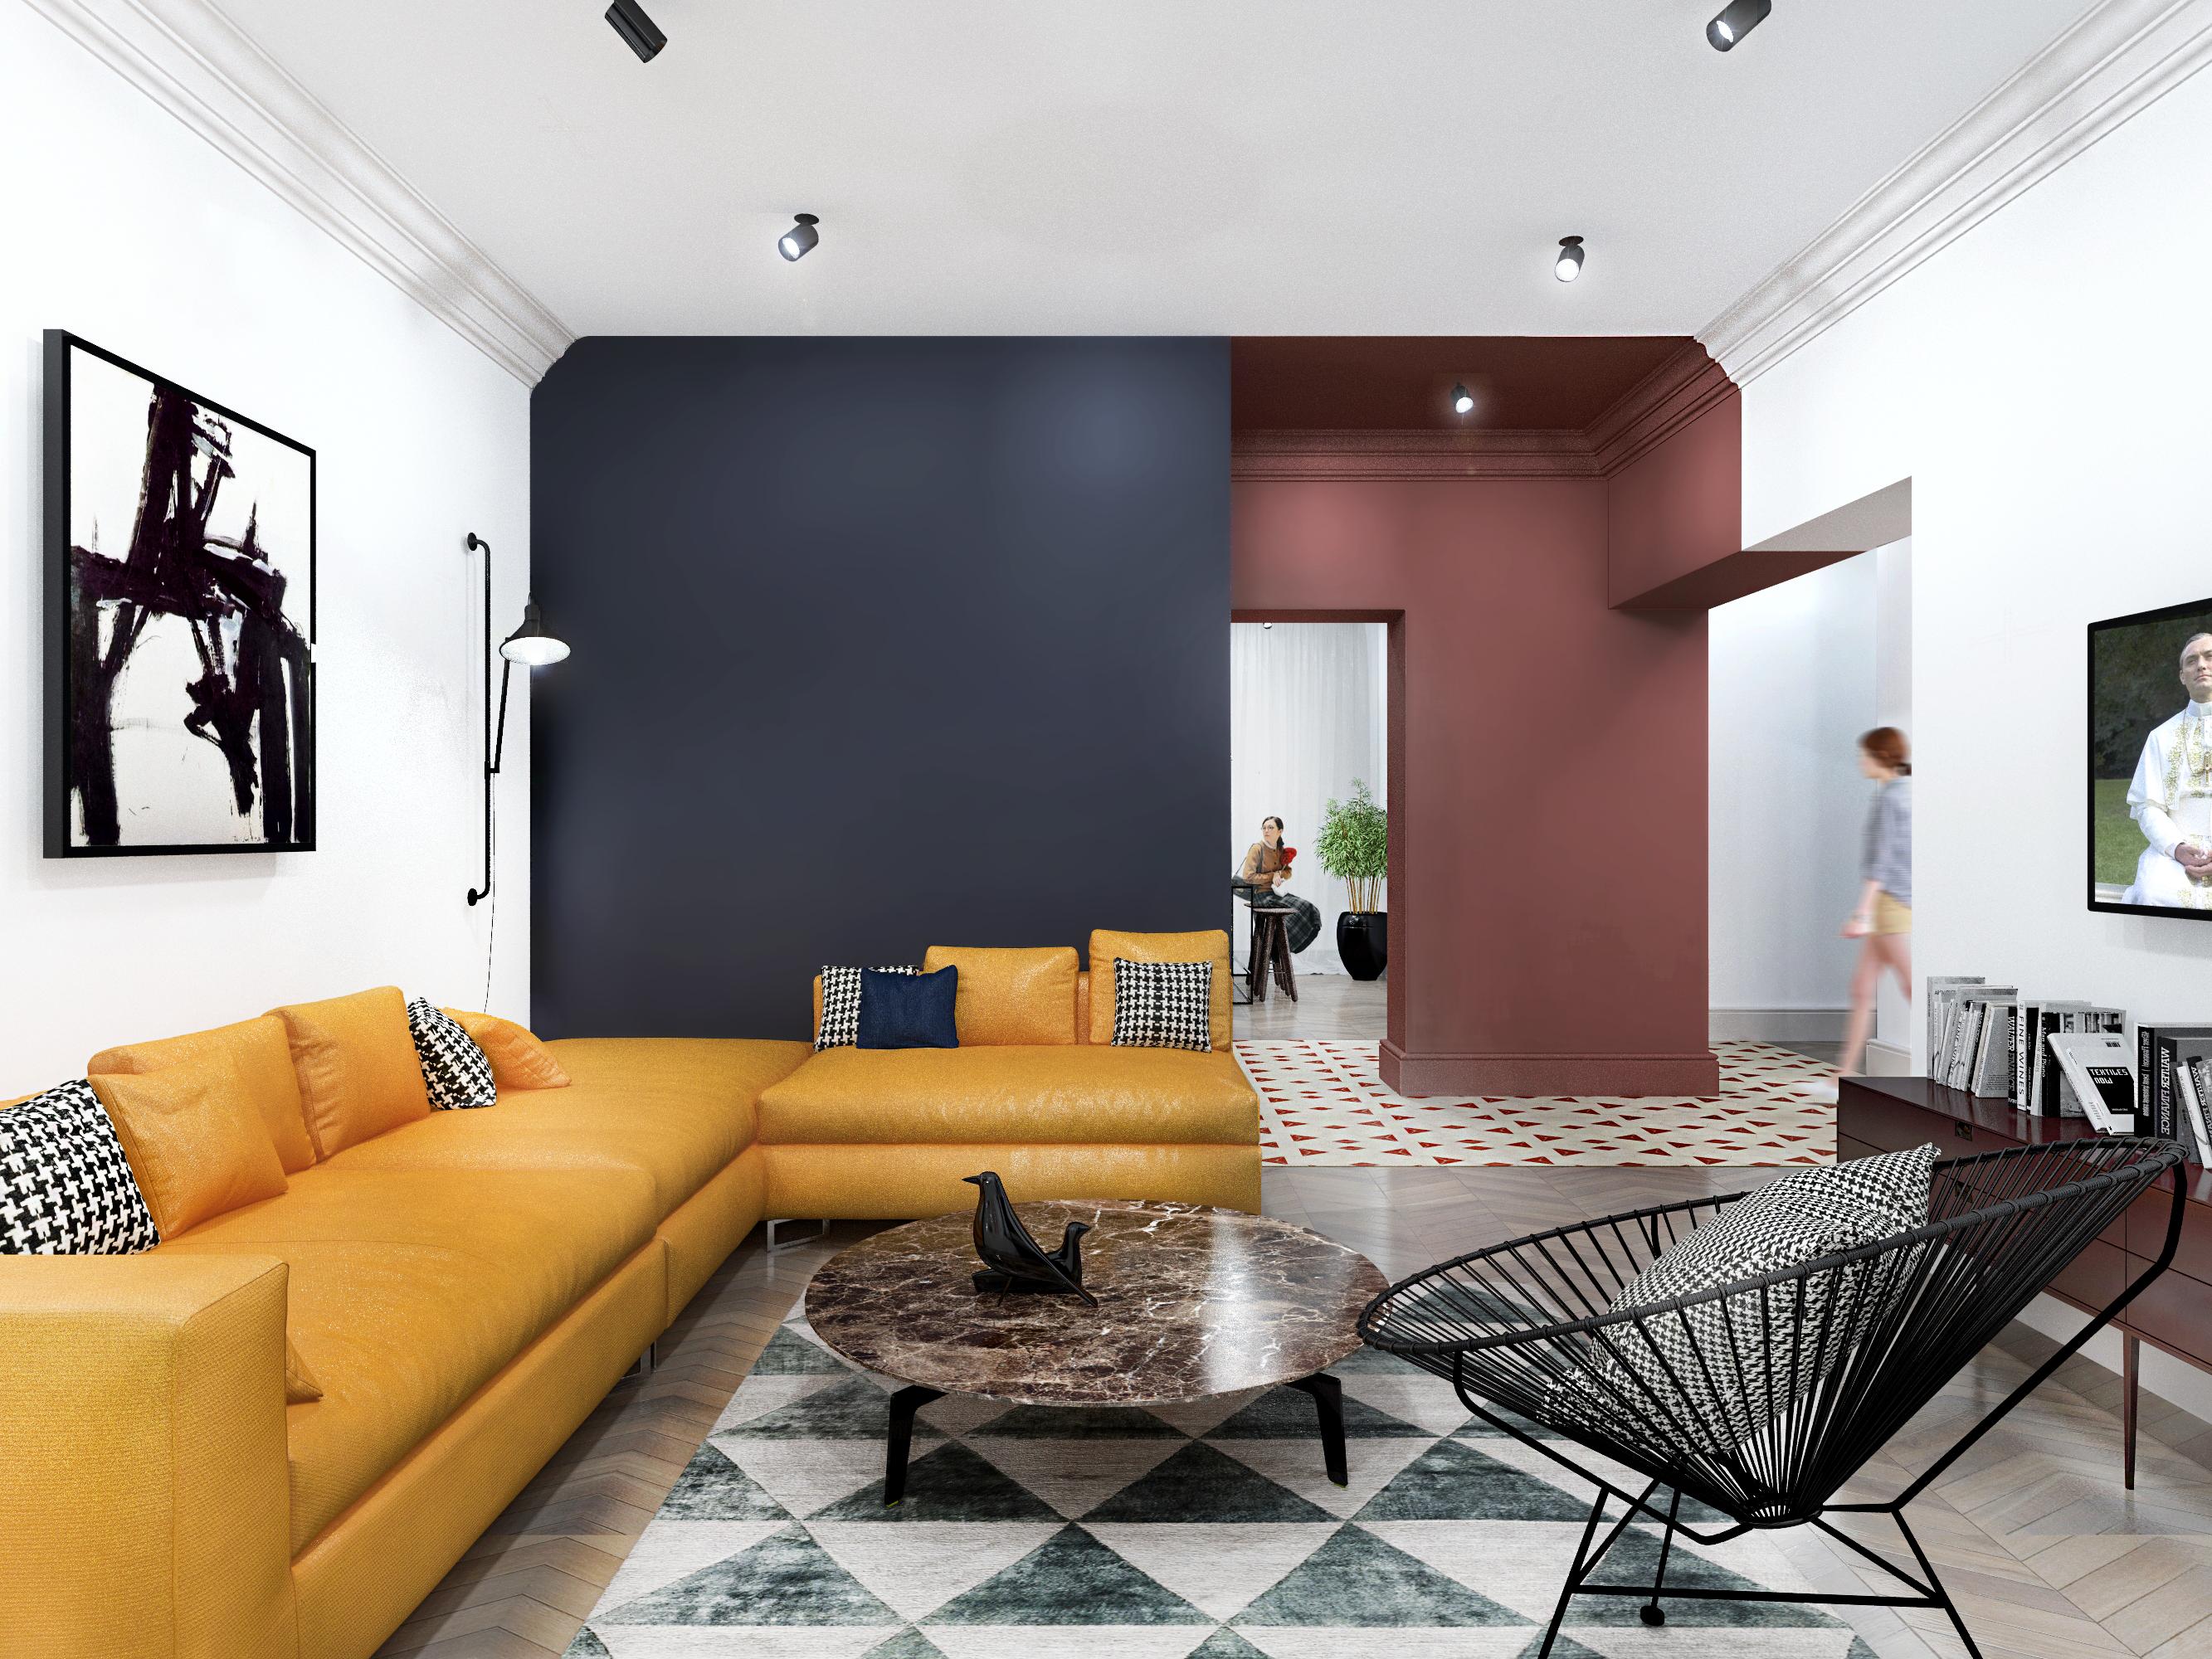 Apt Interior Design Yerevan Armenia Living Room Designs Interior Design Room Design